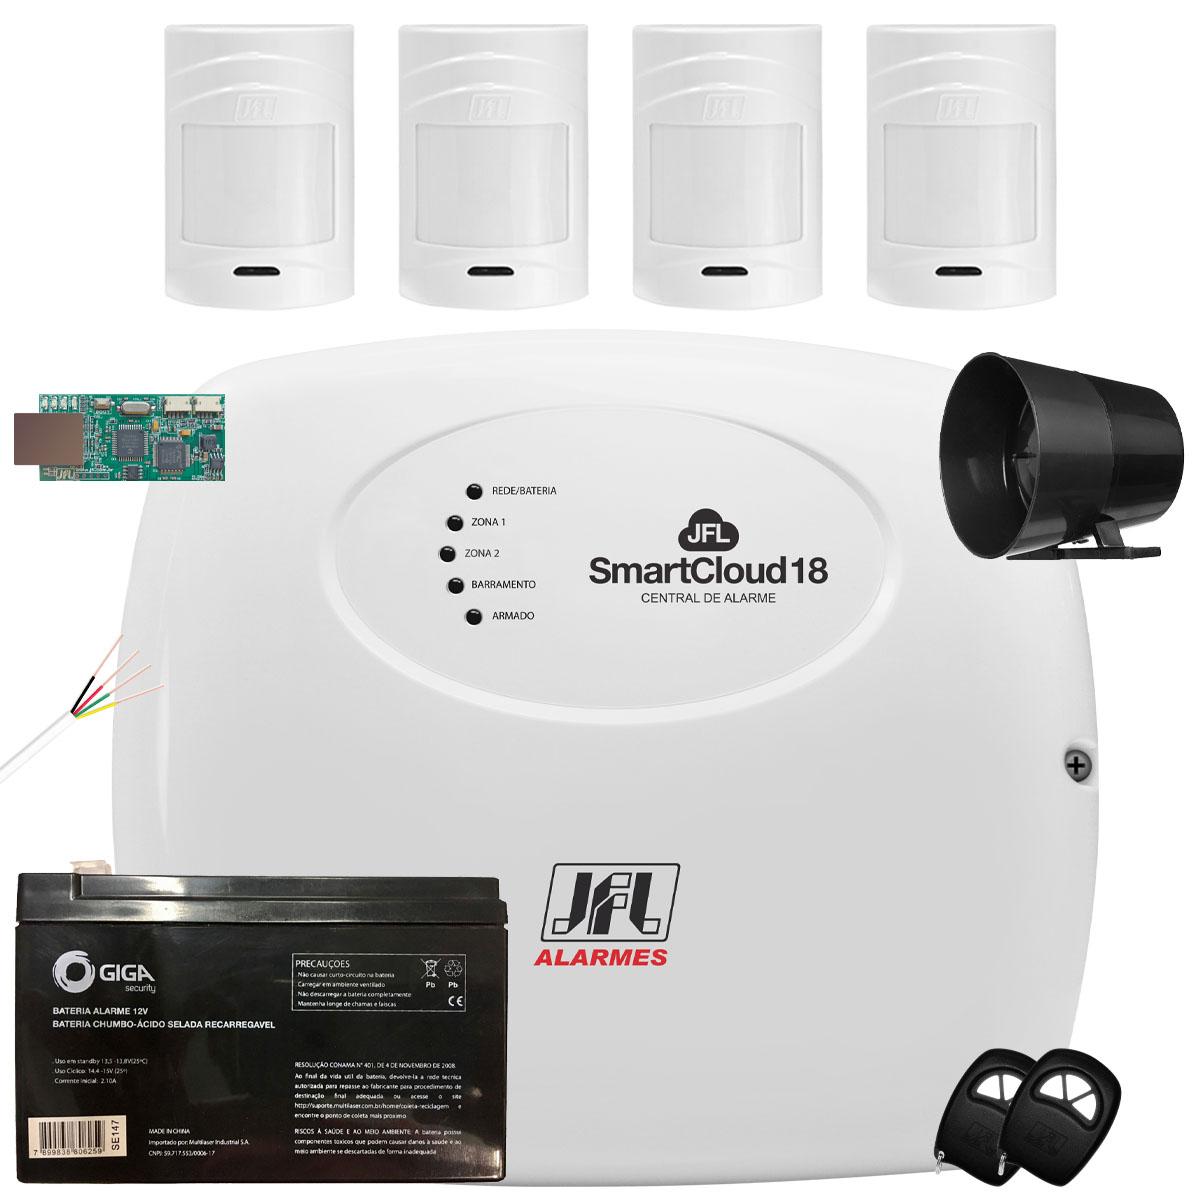 Kit Alarme SmartCloud 18 Jfl 4 Sensores Sem Fio Pet 20Kg IrPet 530Sf